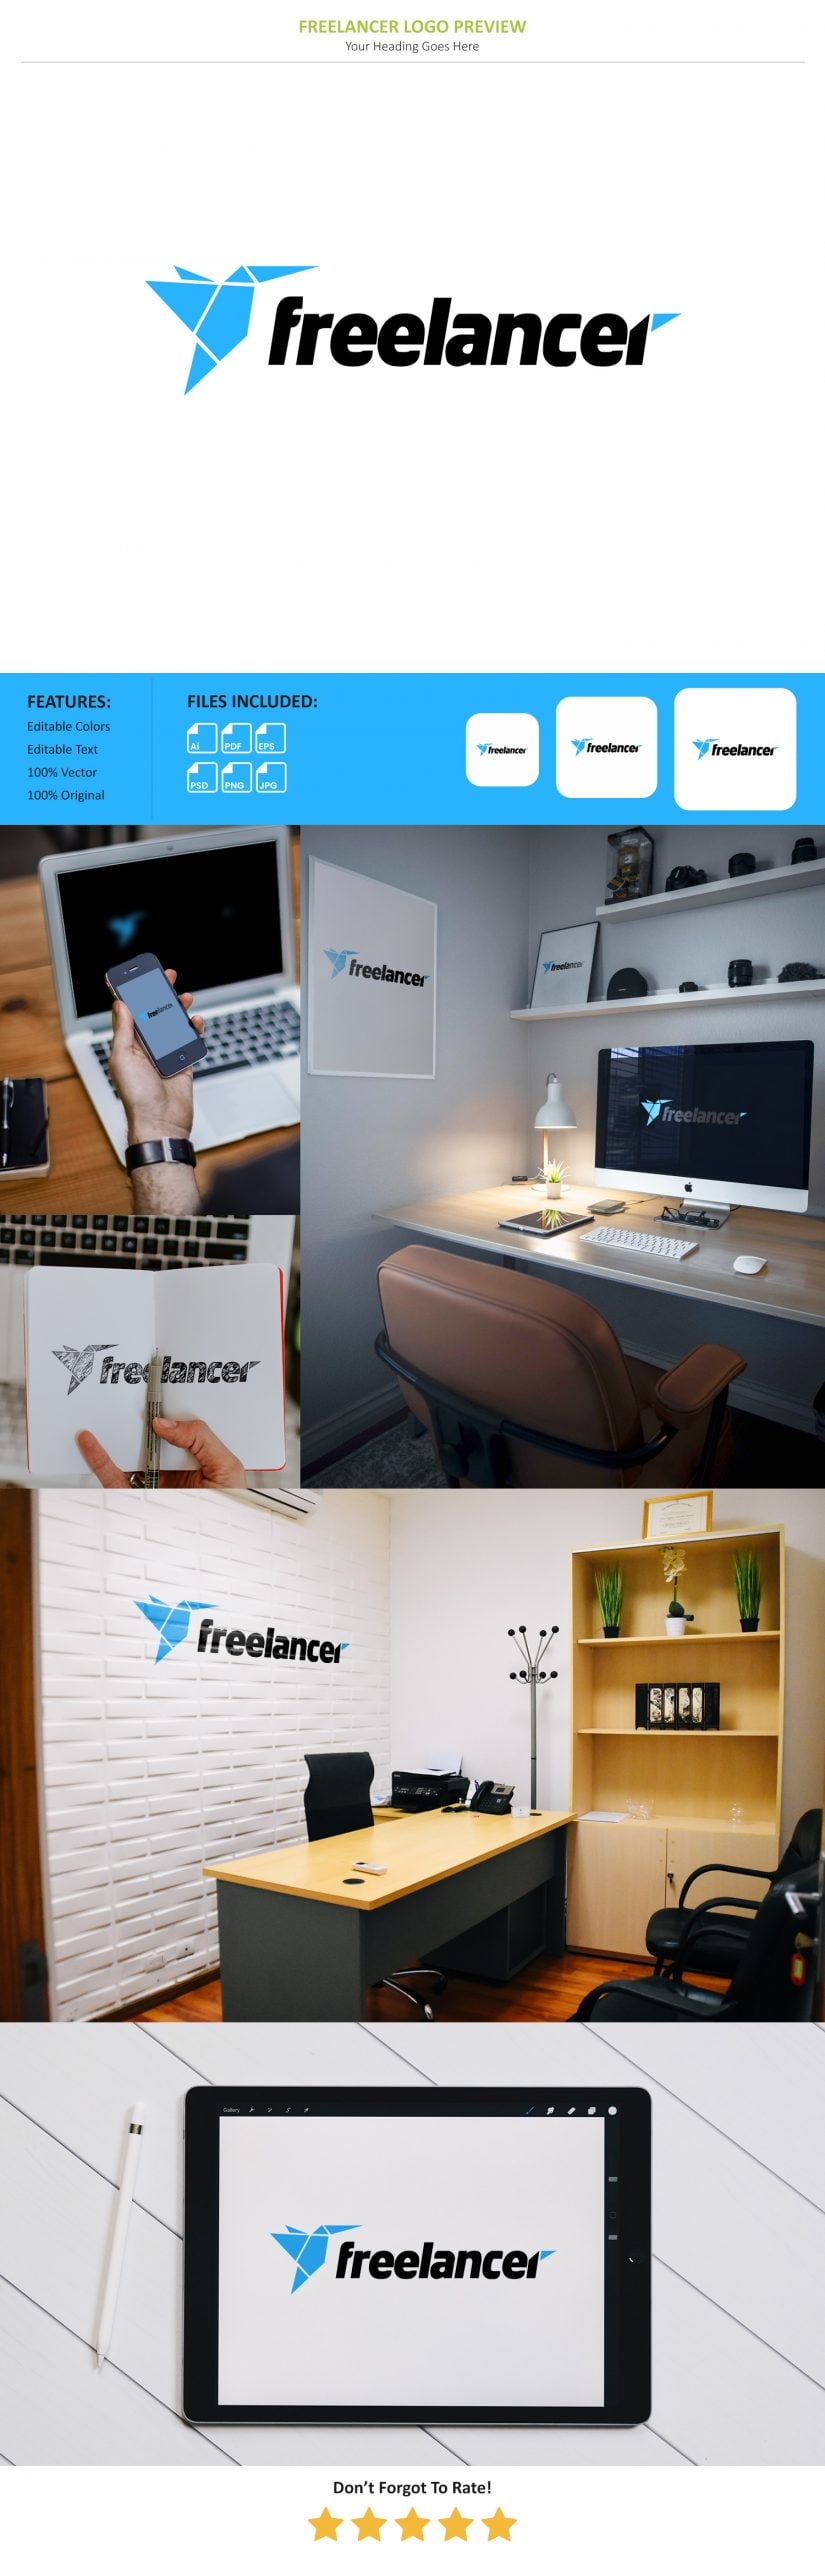 Free Freelancer Logo Preview Mockup